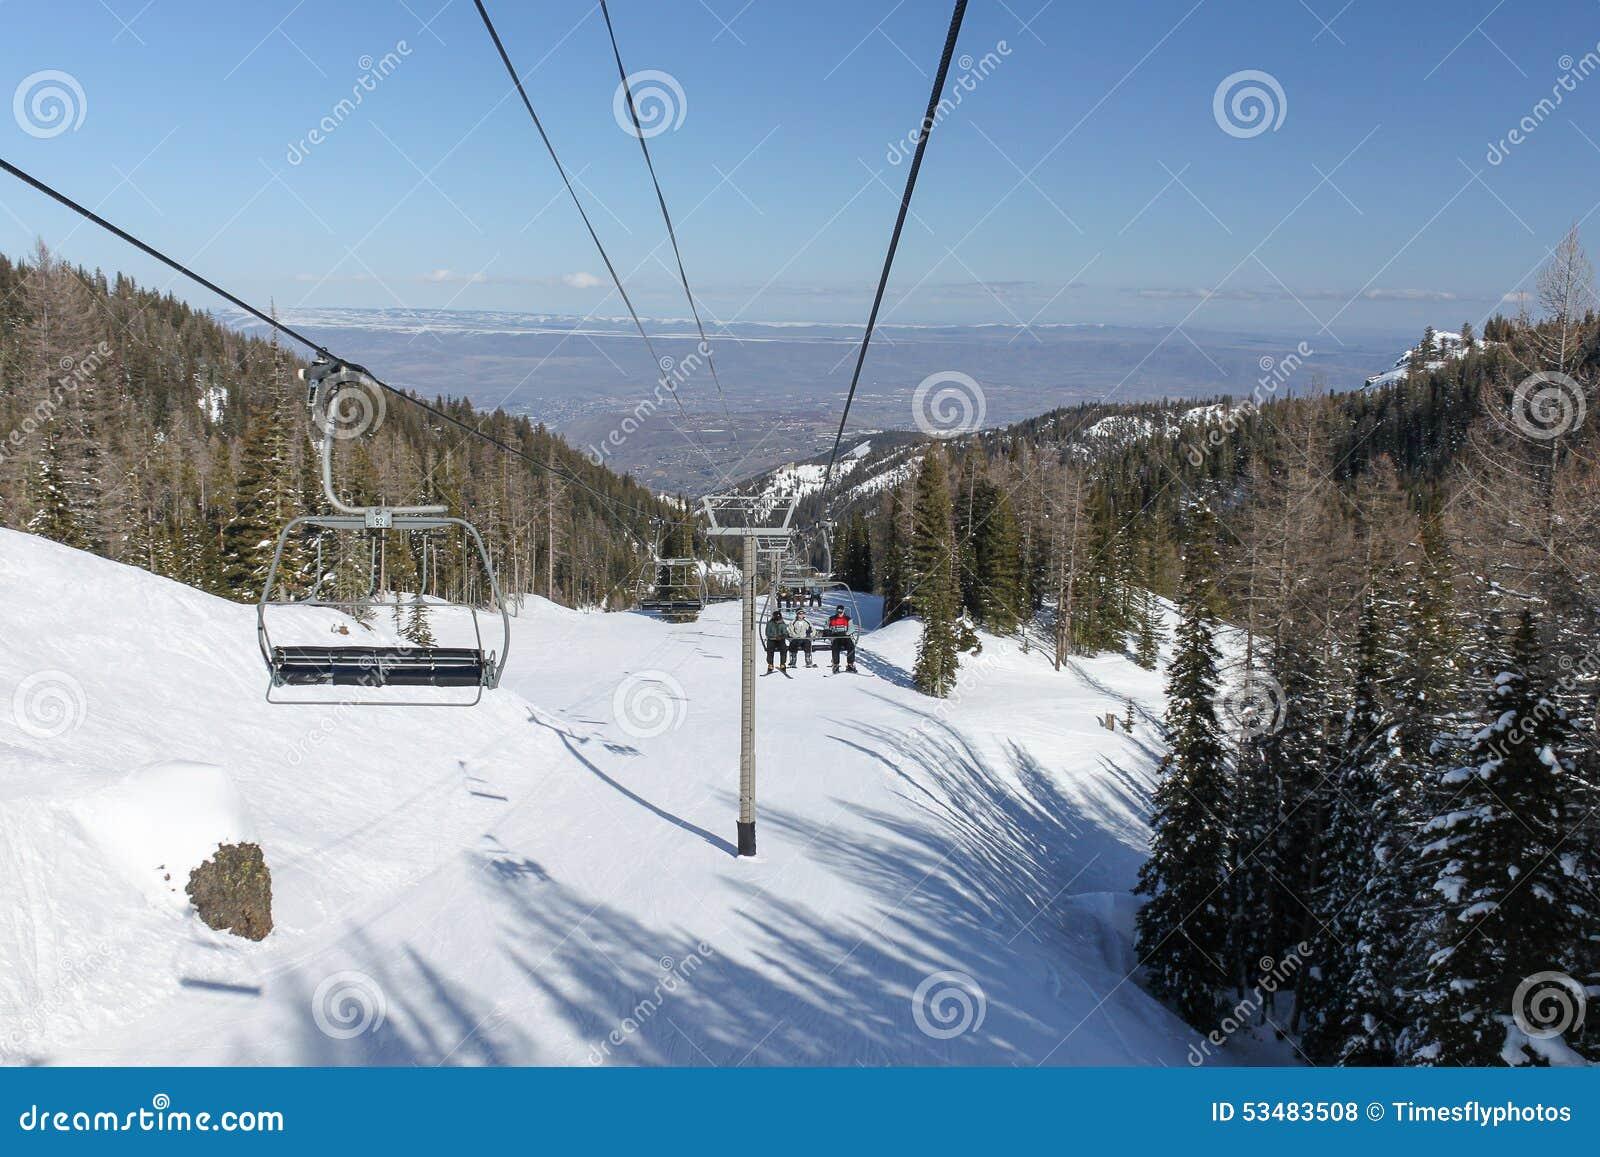 east wenatchee from mission ridge ski resort stock photo - image of